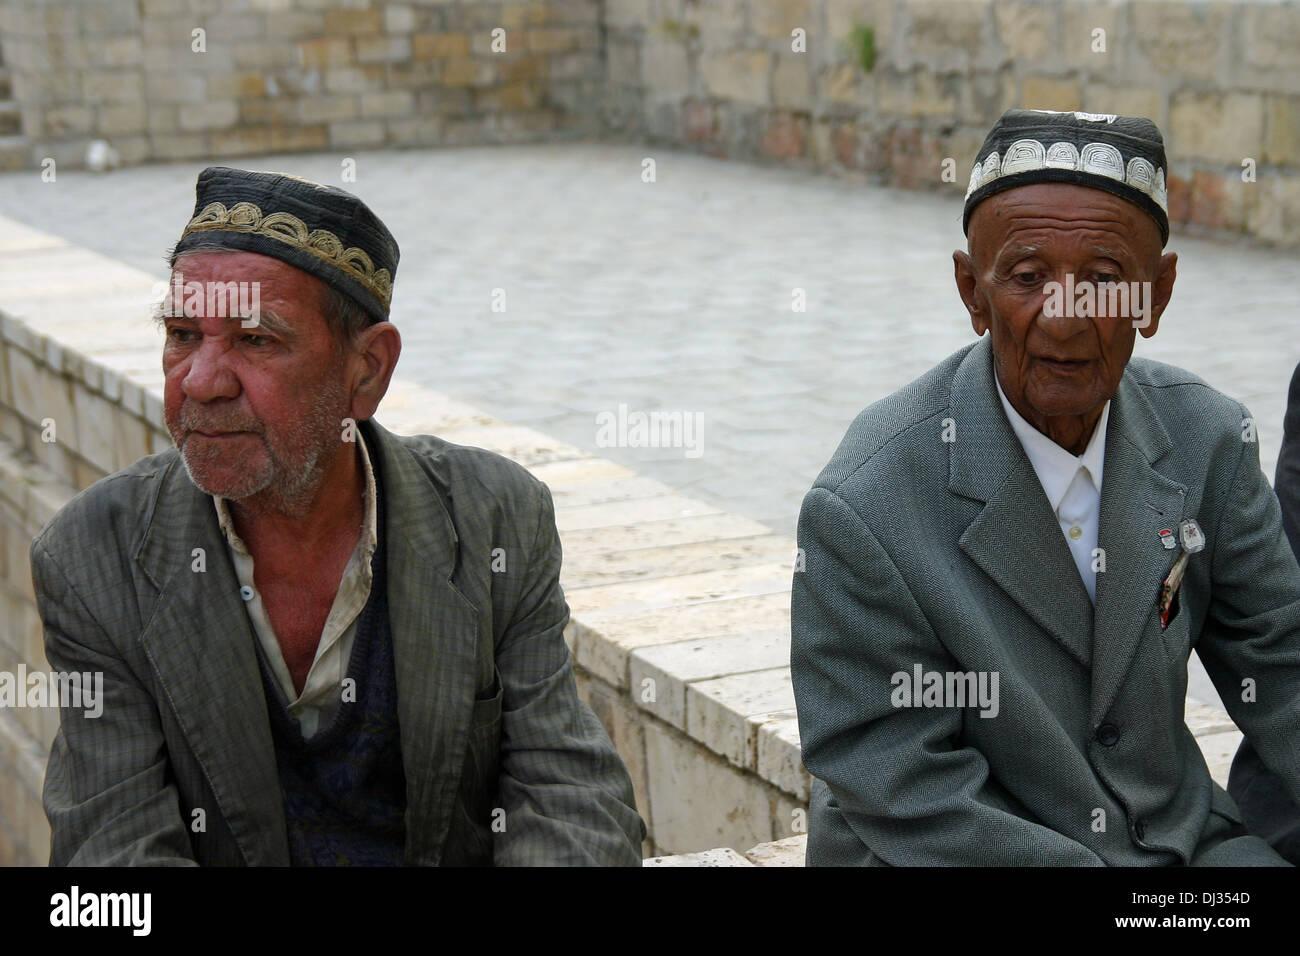 Tradizionali di colleghi in Samarcanda, Uzbekistan Immagini Stock